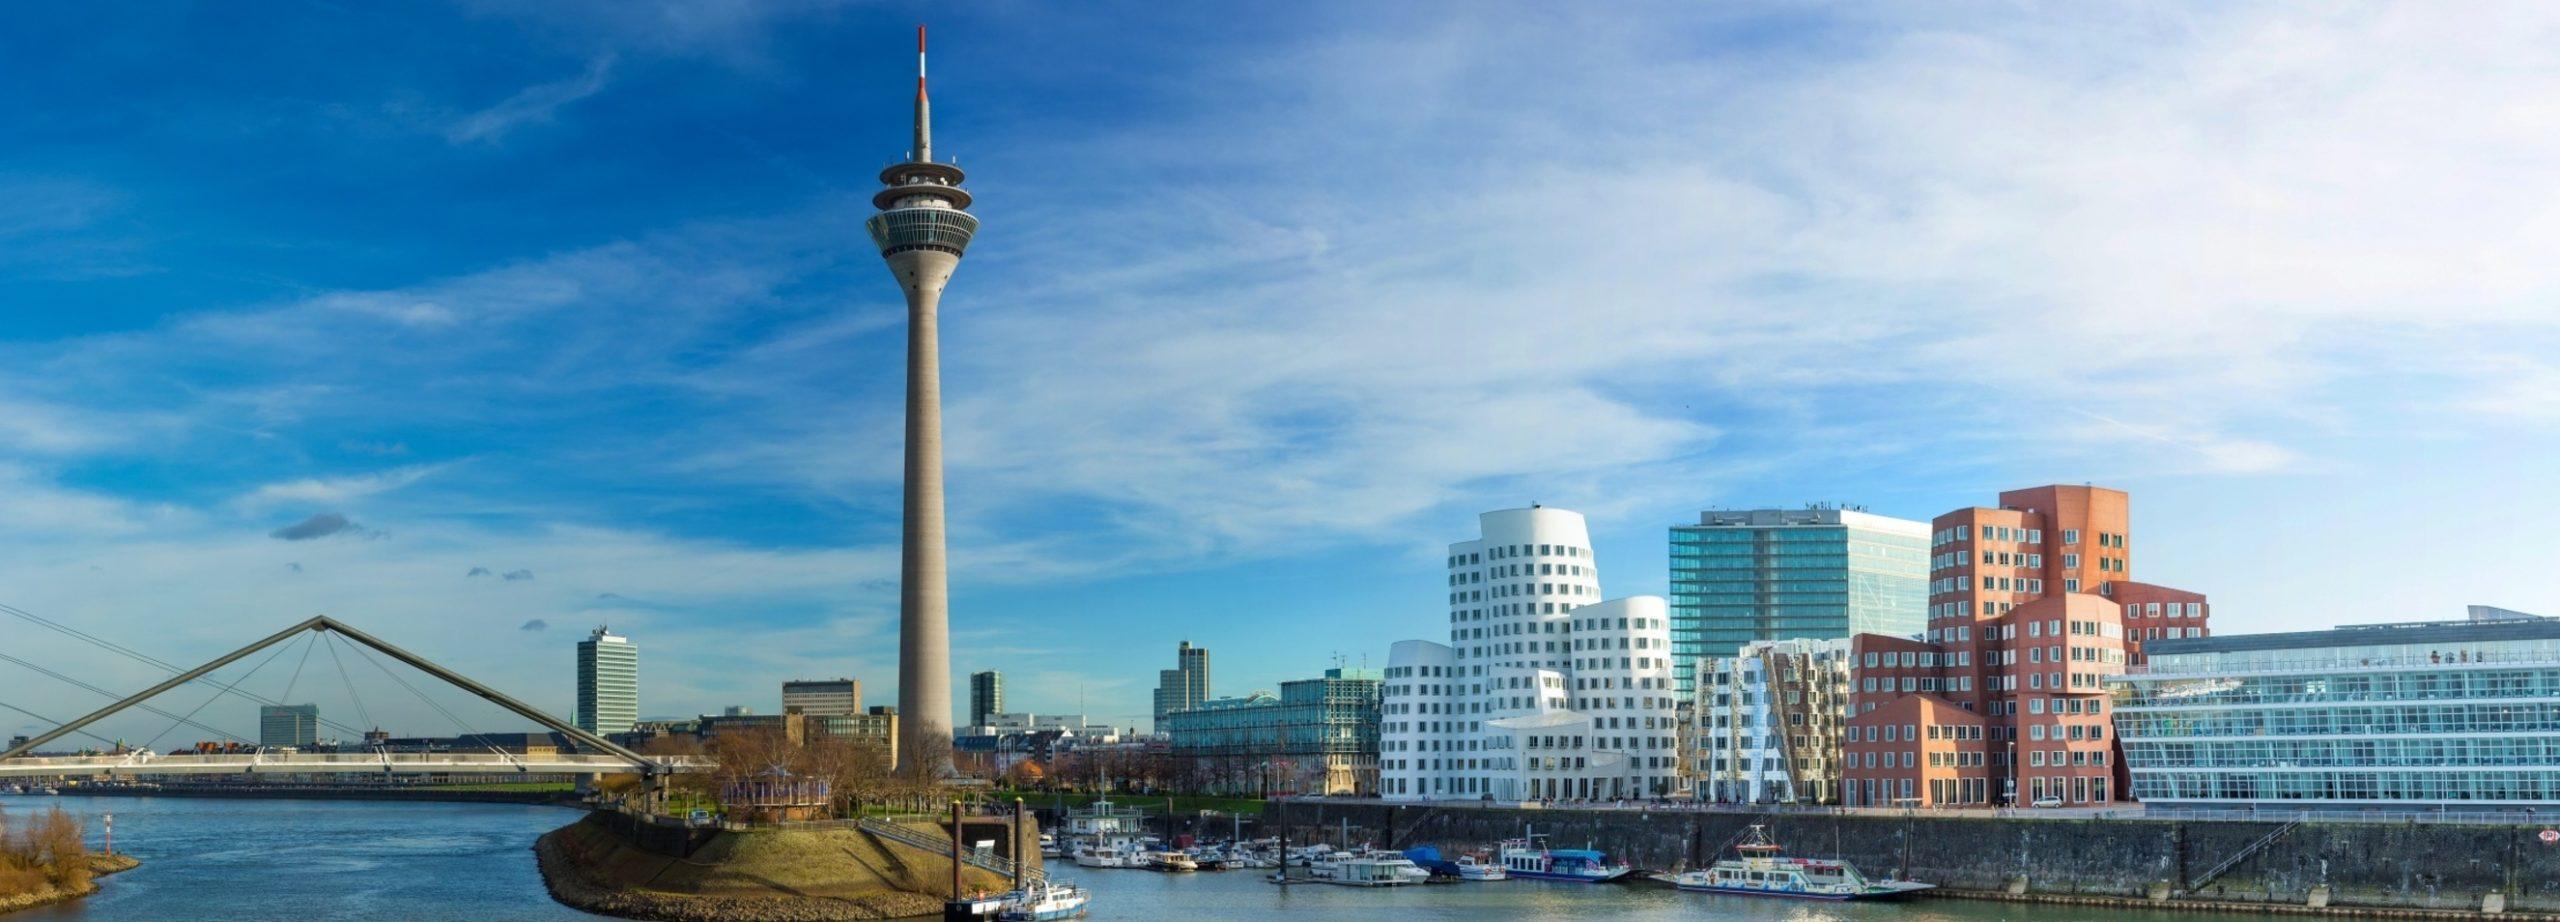 Personalberatung-Düsseldorf-3